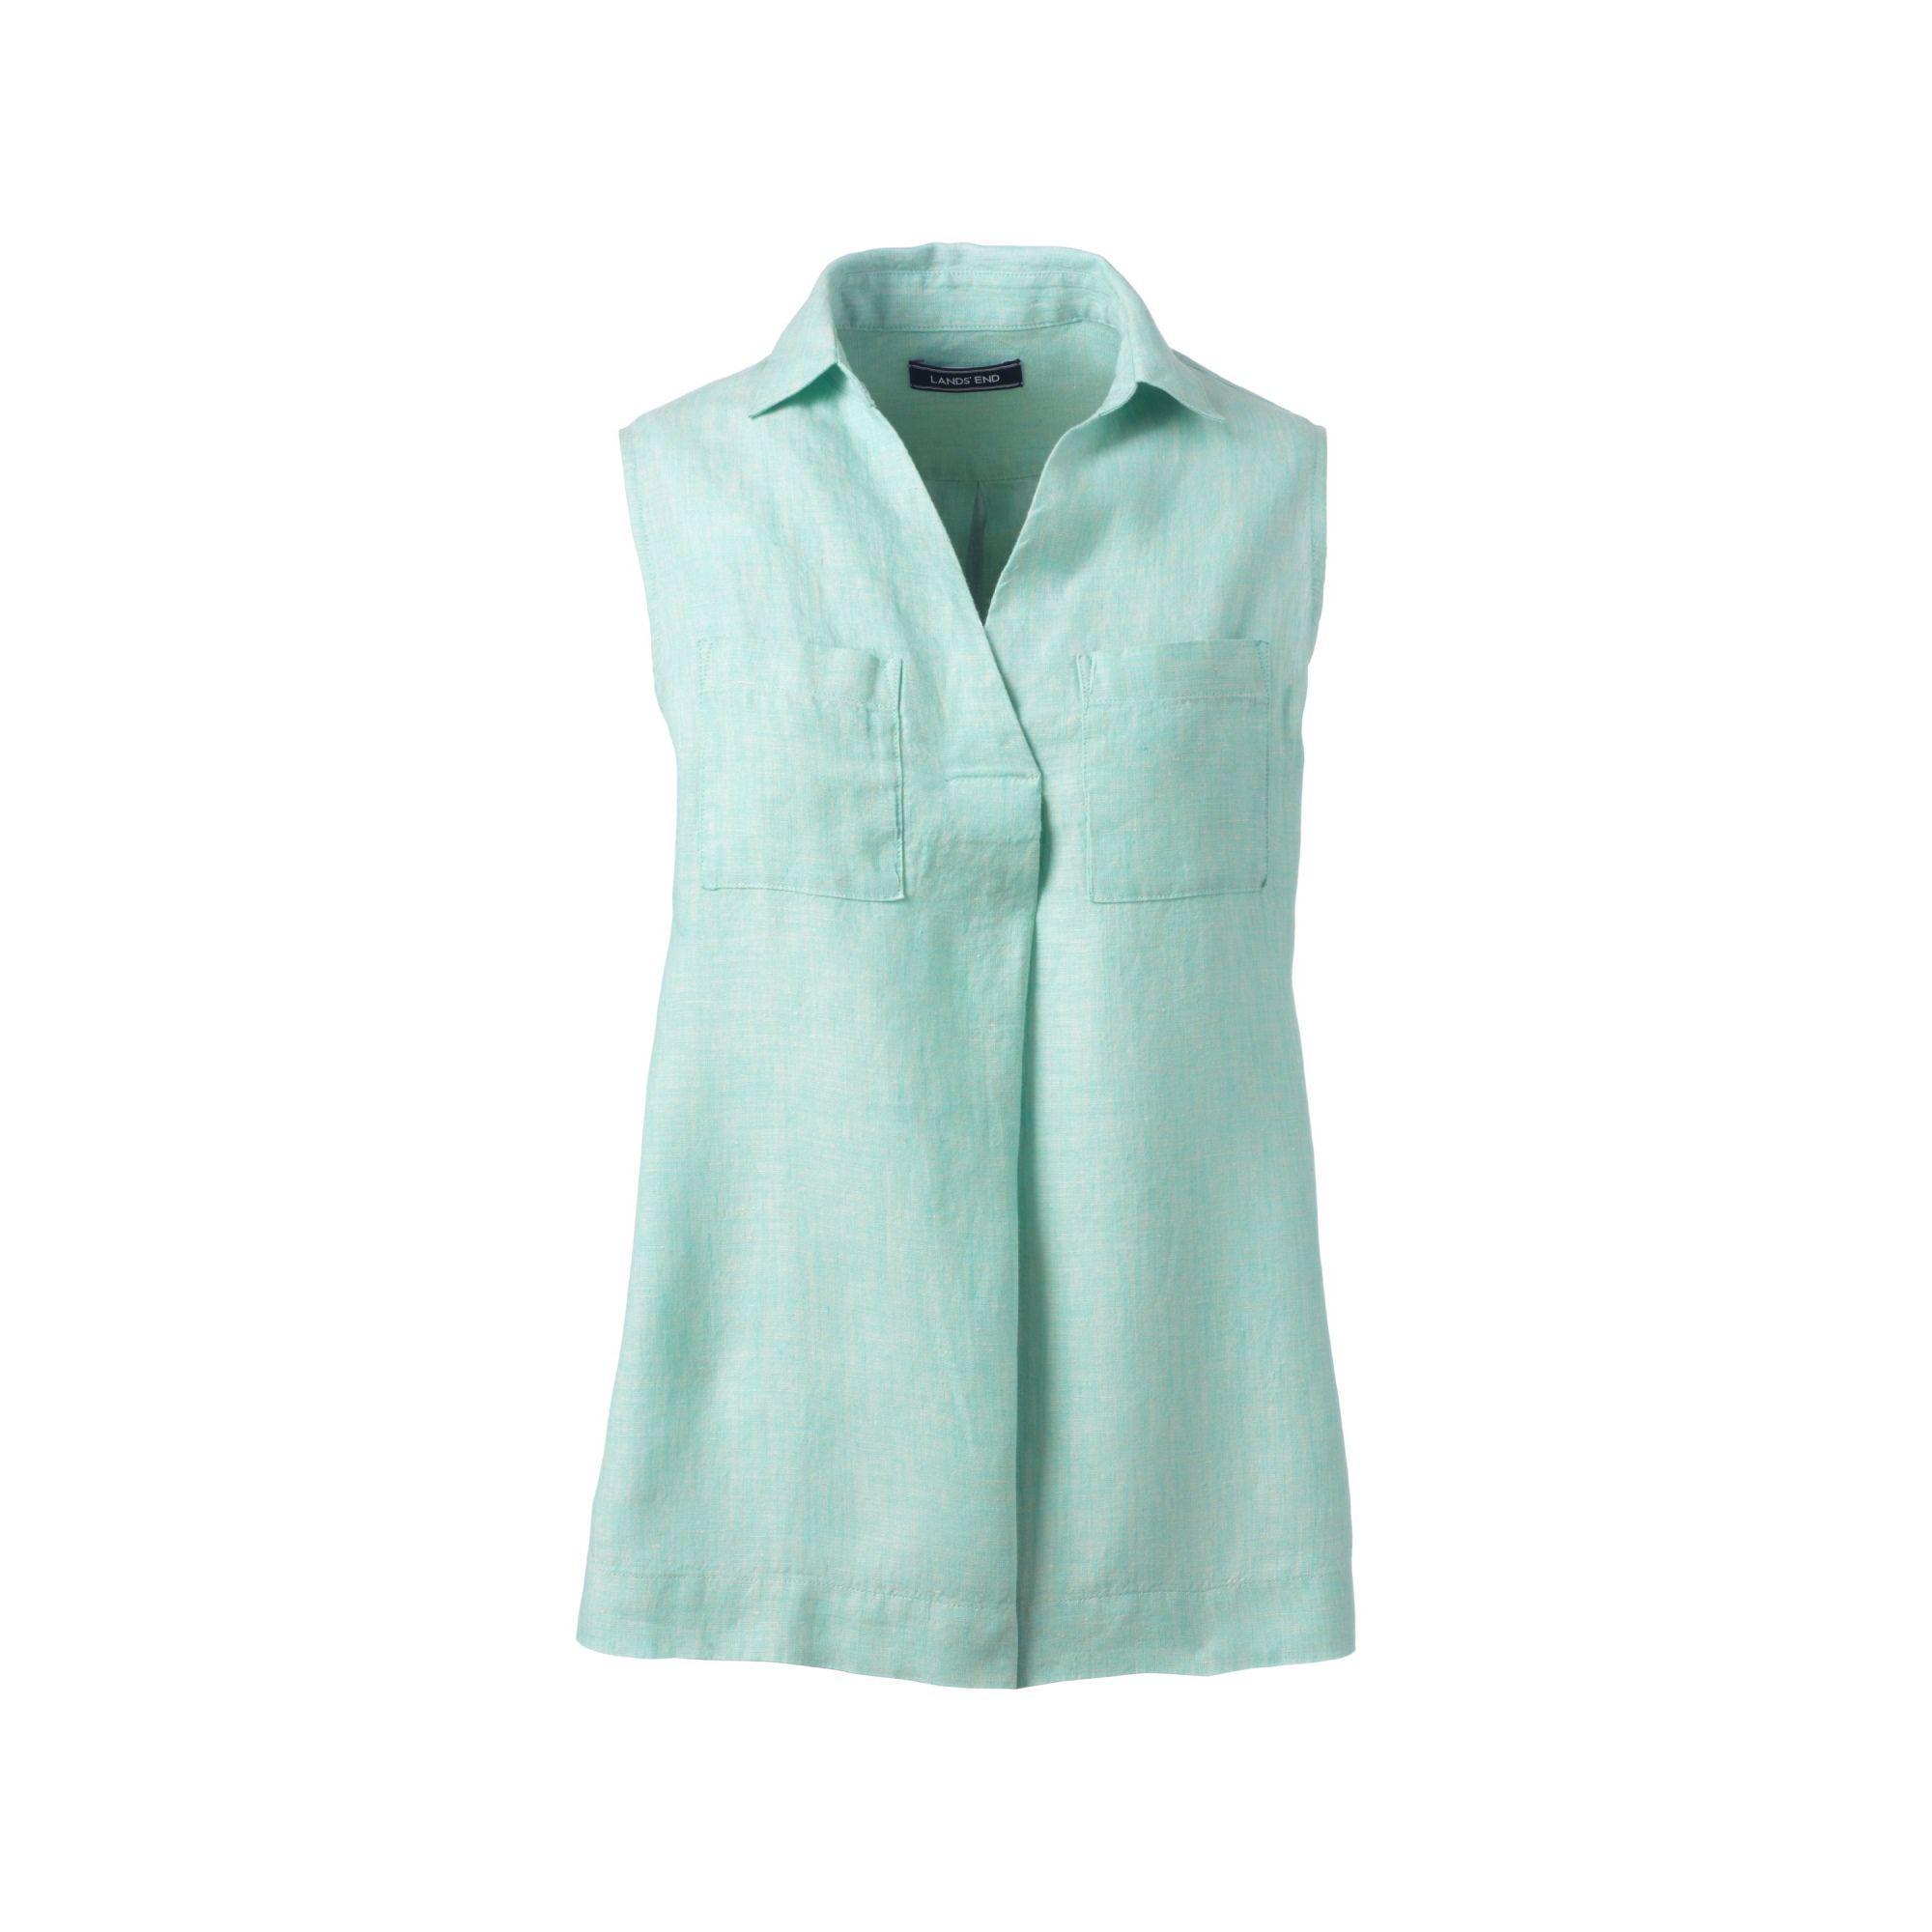 7c64fa34c17d43 Lands  End Blue Womens Sleeveless Linen Top in Blue - Lyst